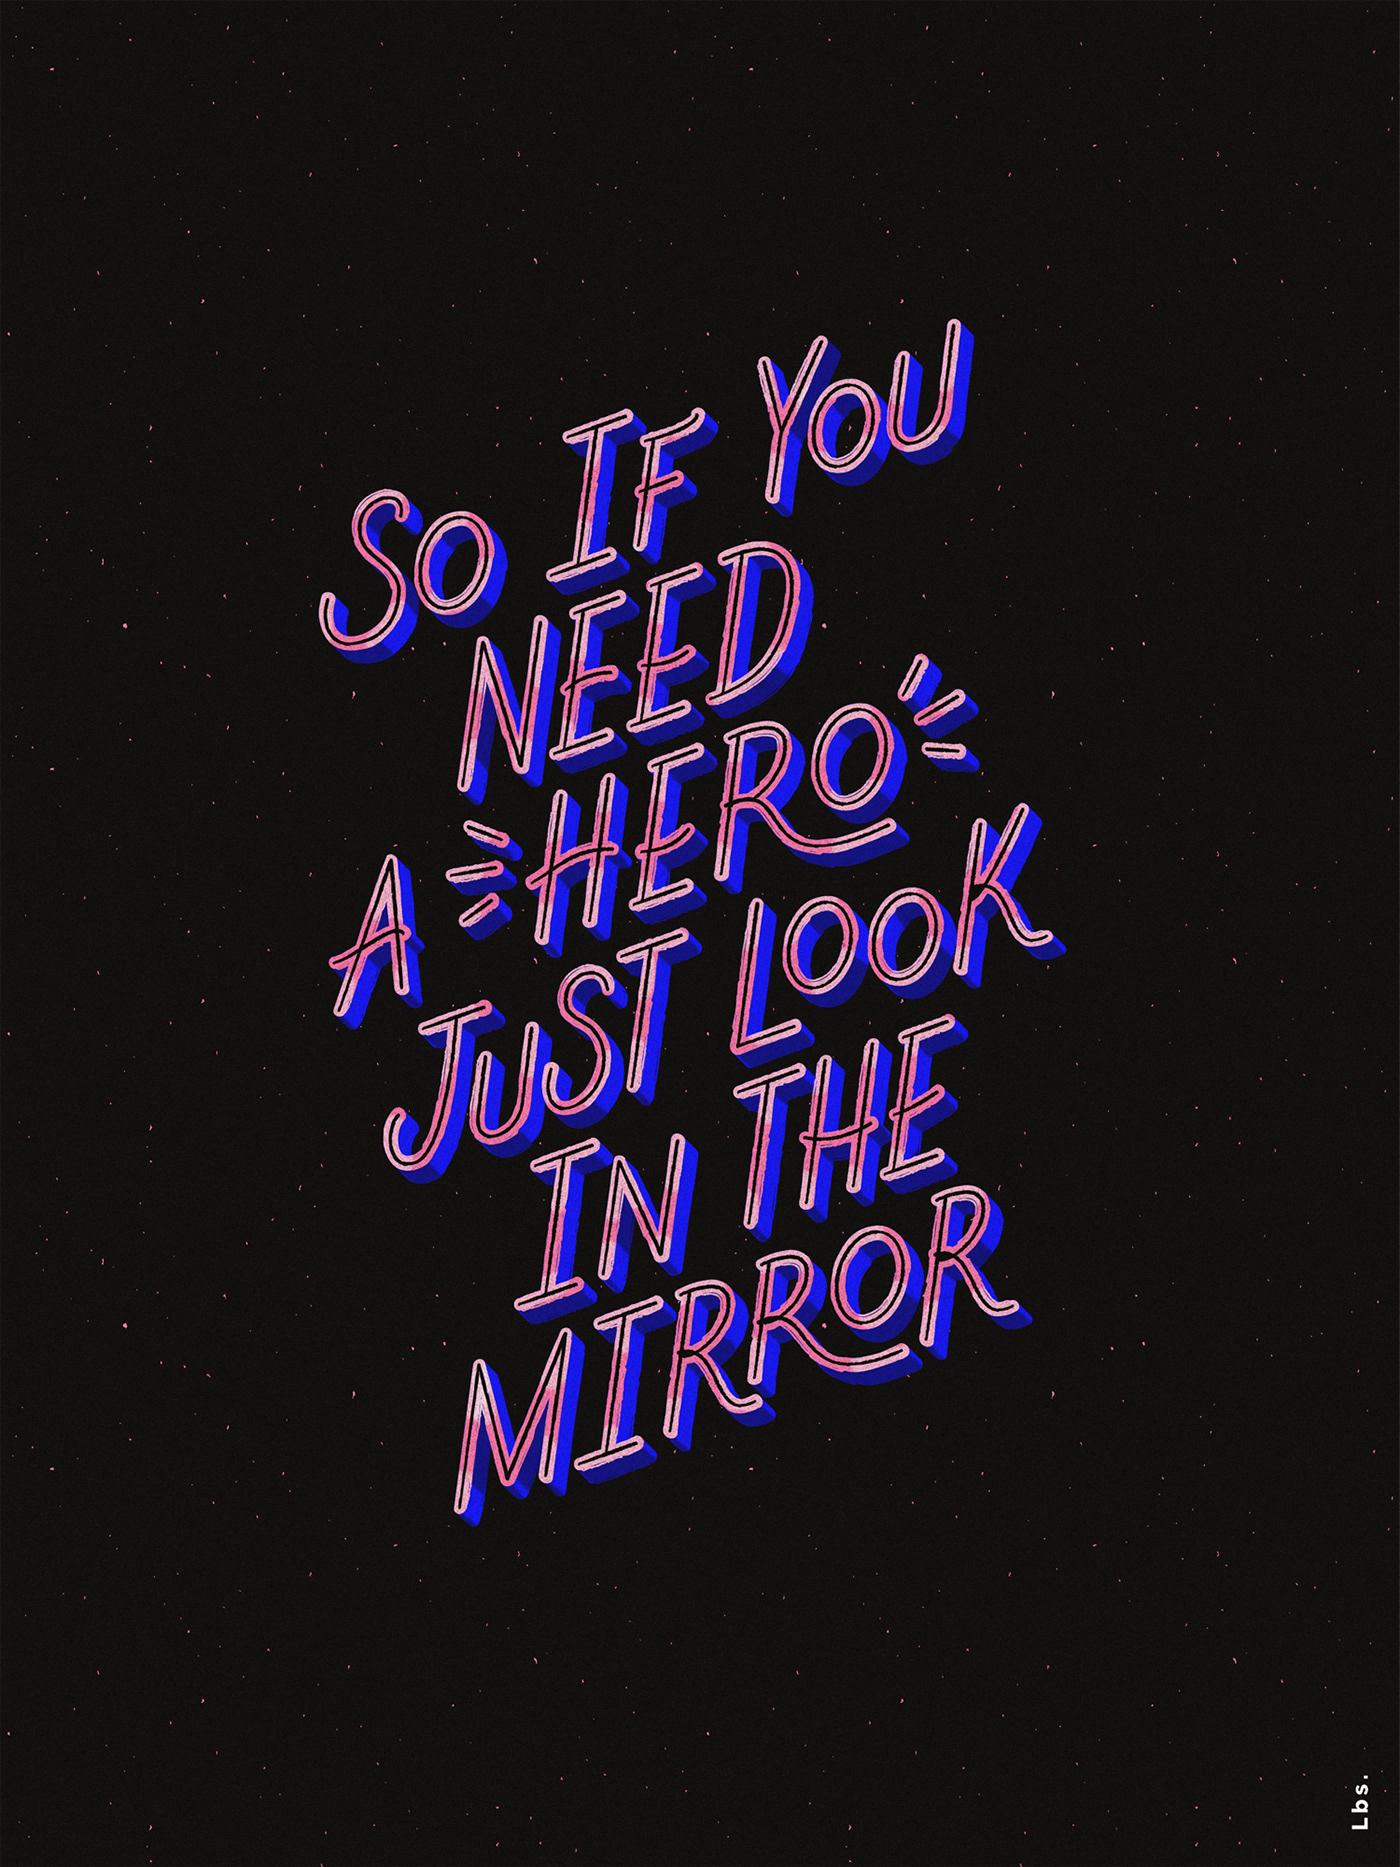 type lettering Lyrics kali uchis ILLUSTRATION  Hero music inspire UI Digital Art